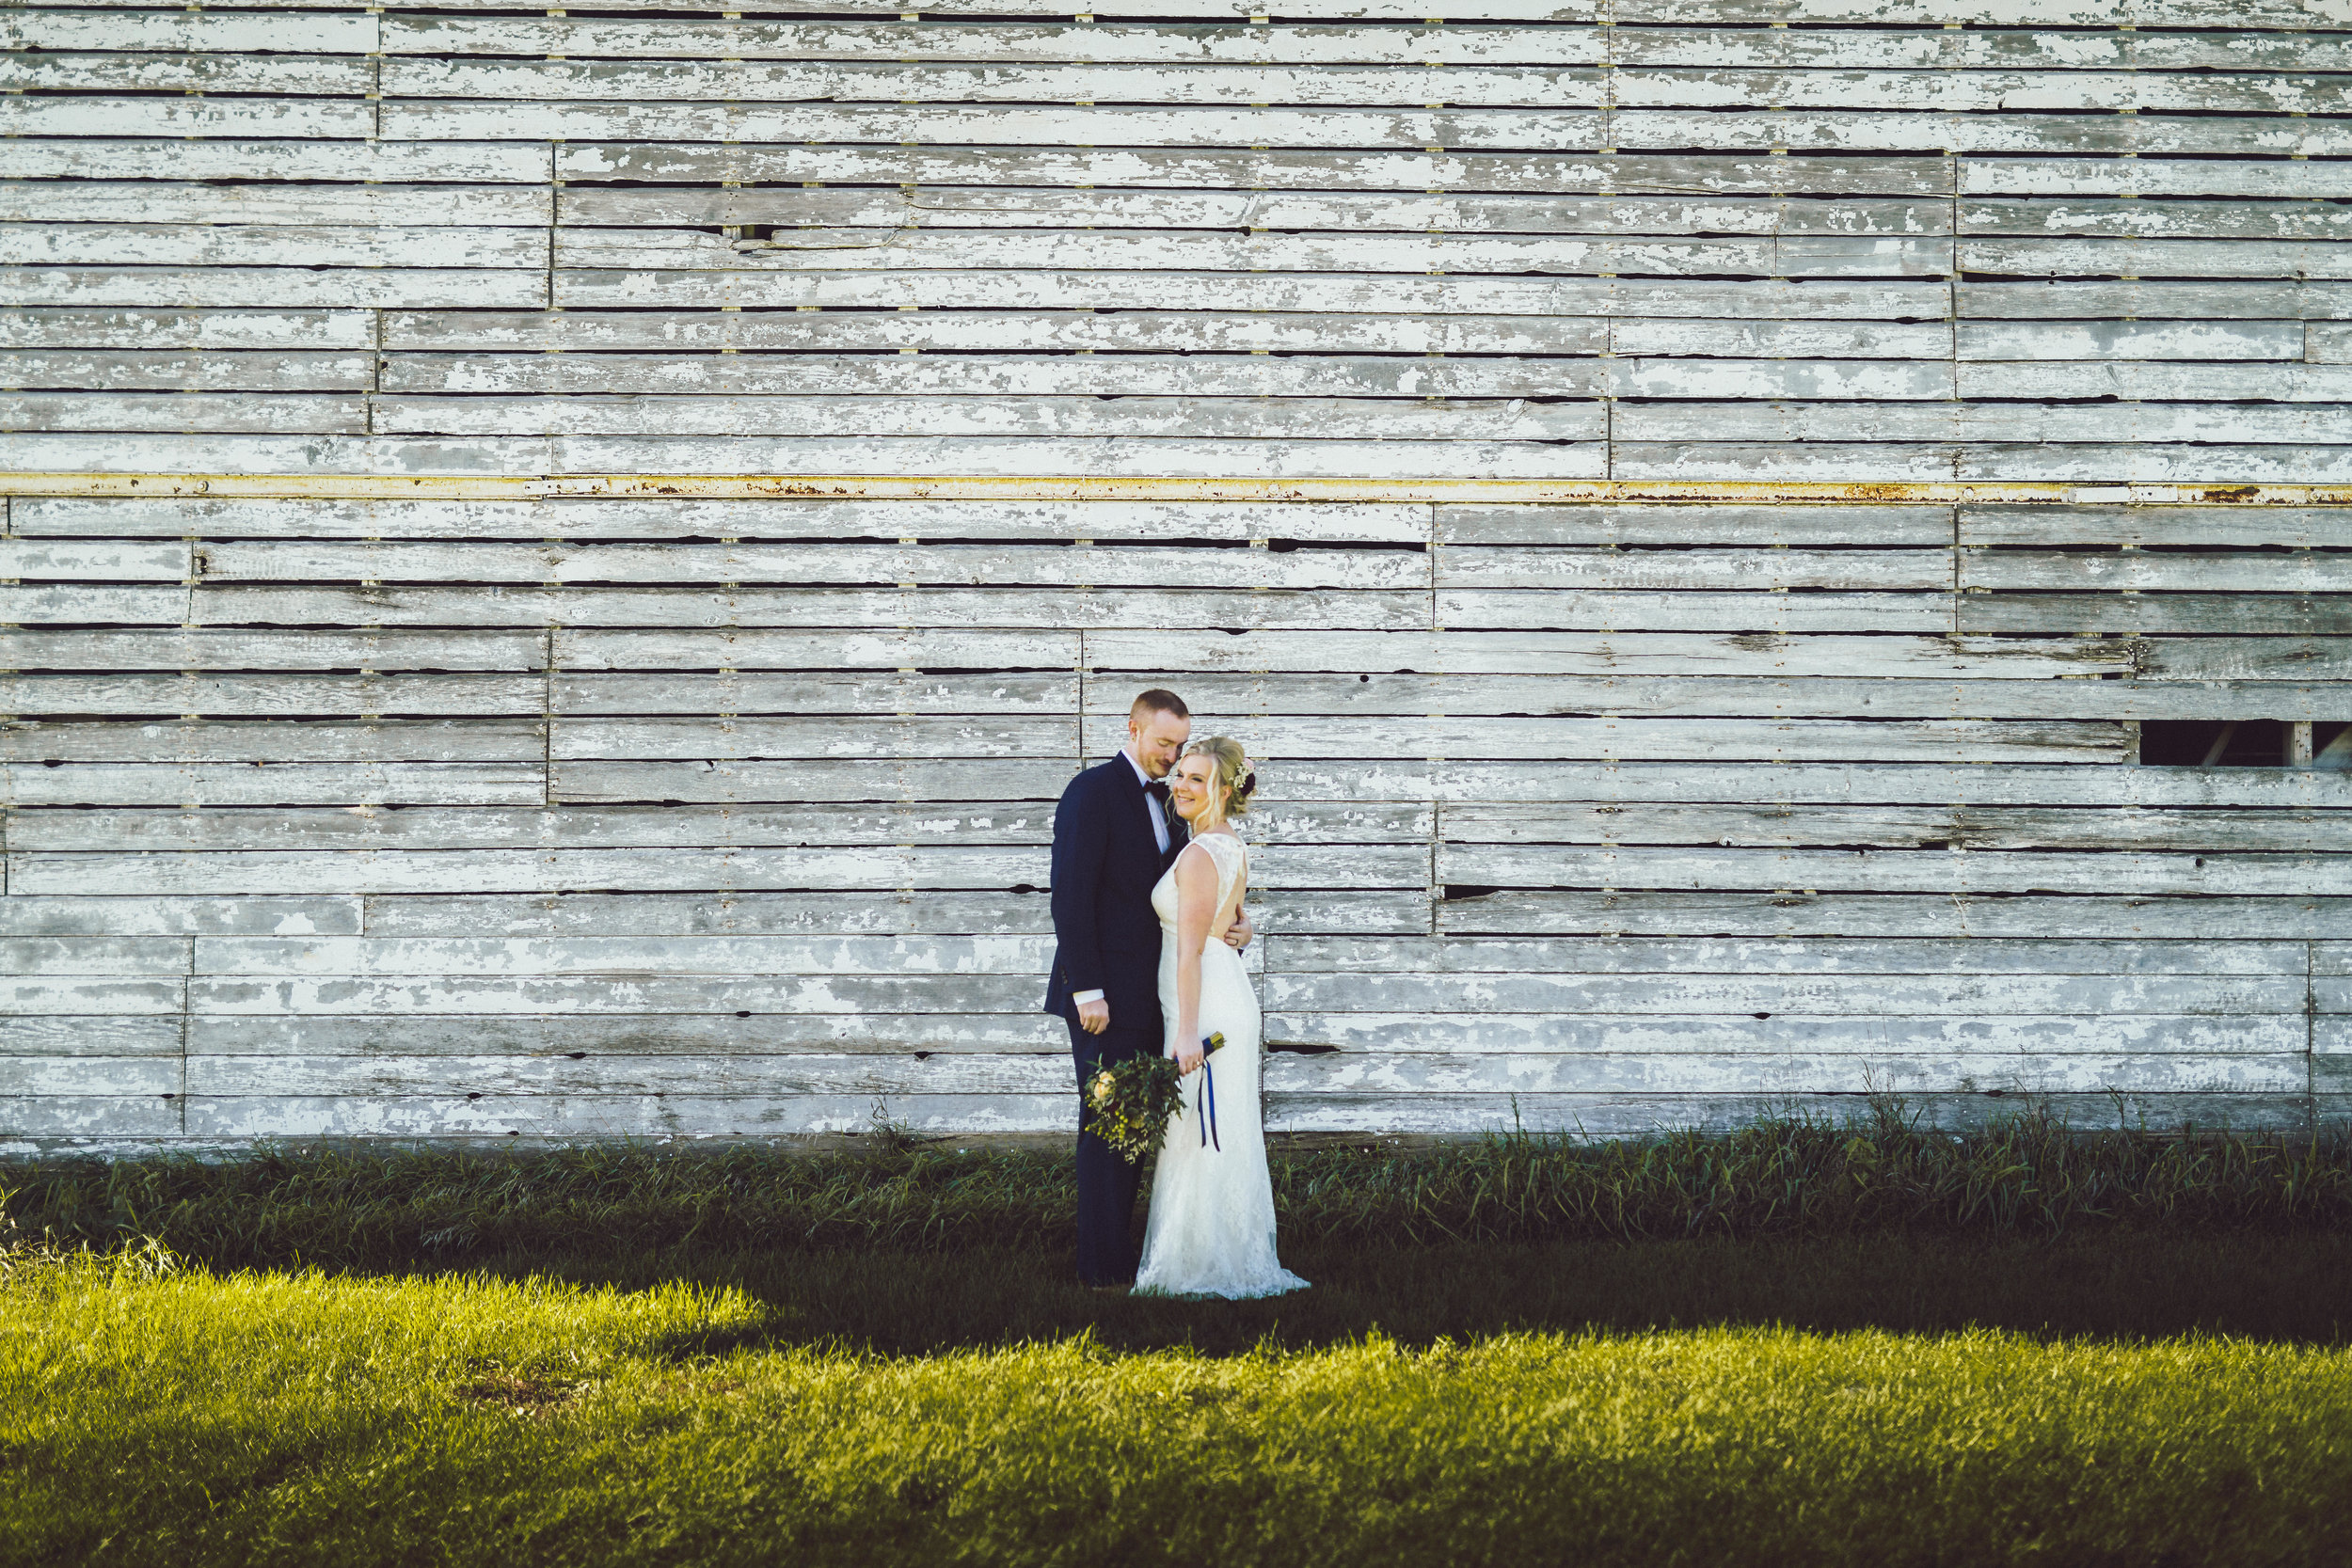 2star_des-moines-wedding-c-e -6.jpg